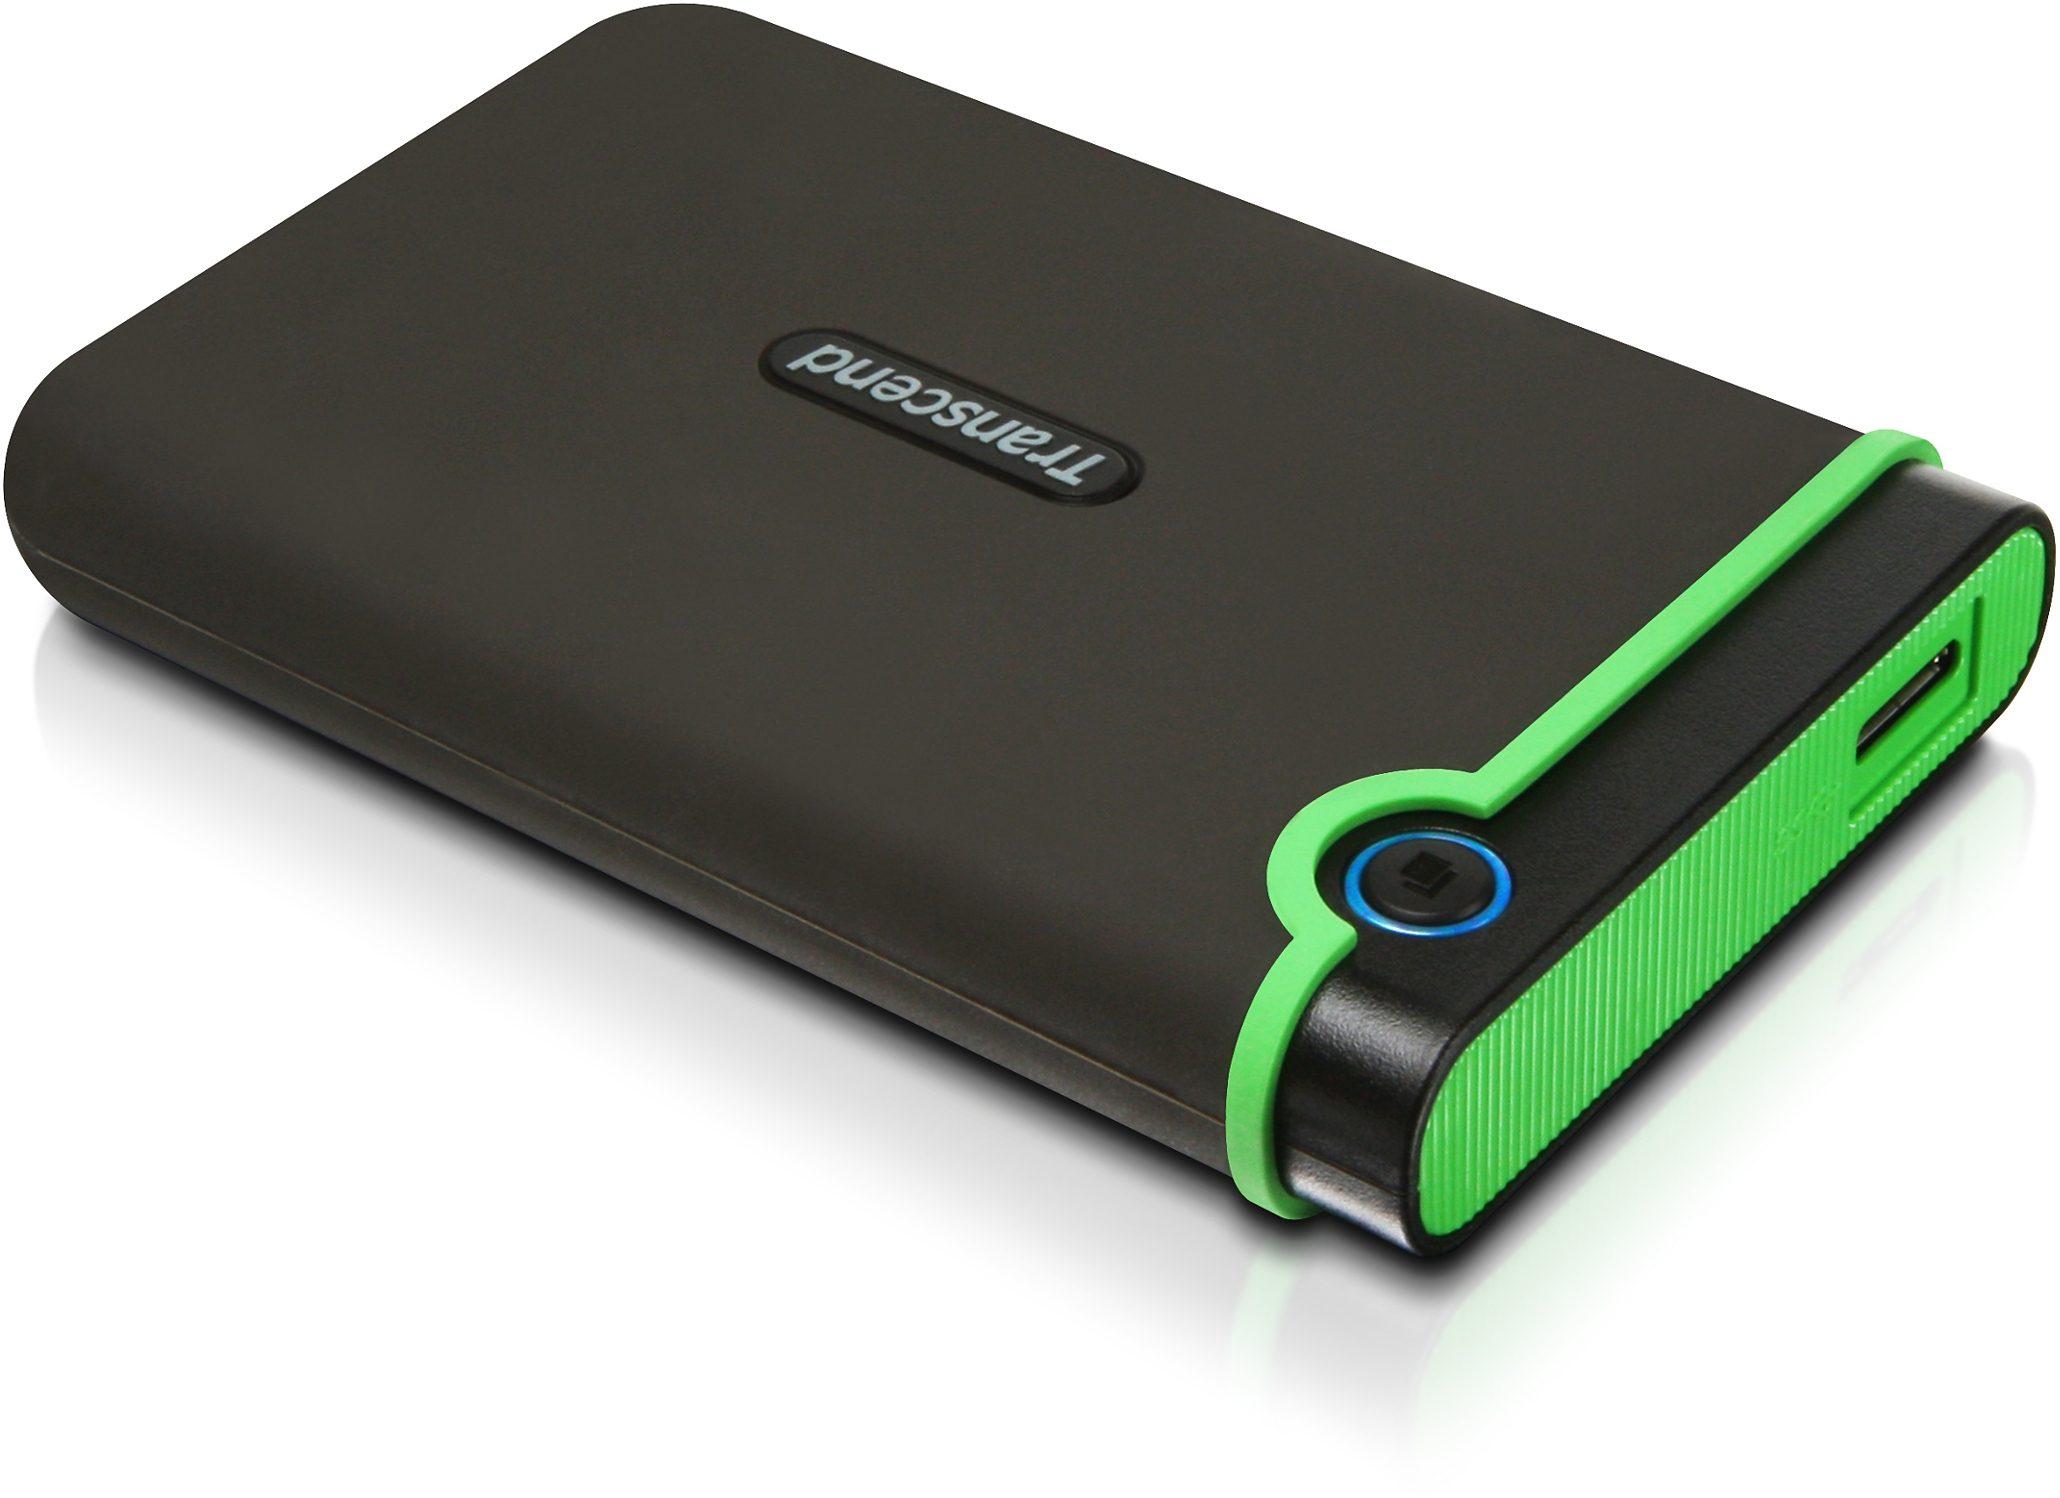 Transcend StoreJet 25 M3 Anti-Schock 1TB externe Festplatte, USB 3.0